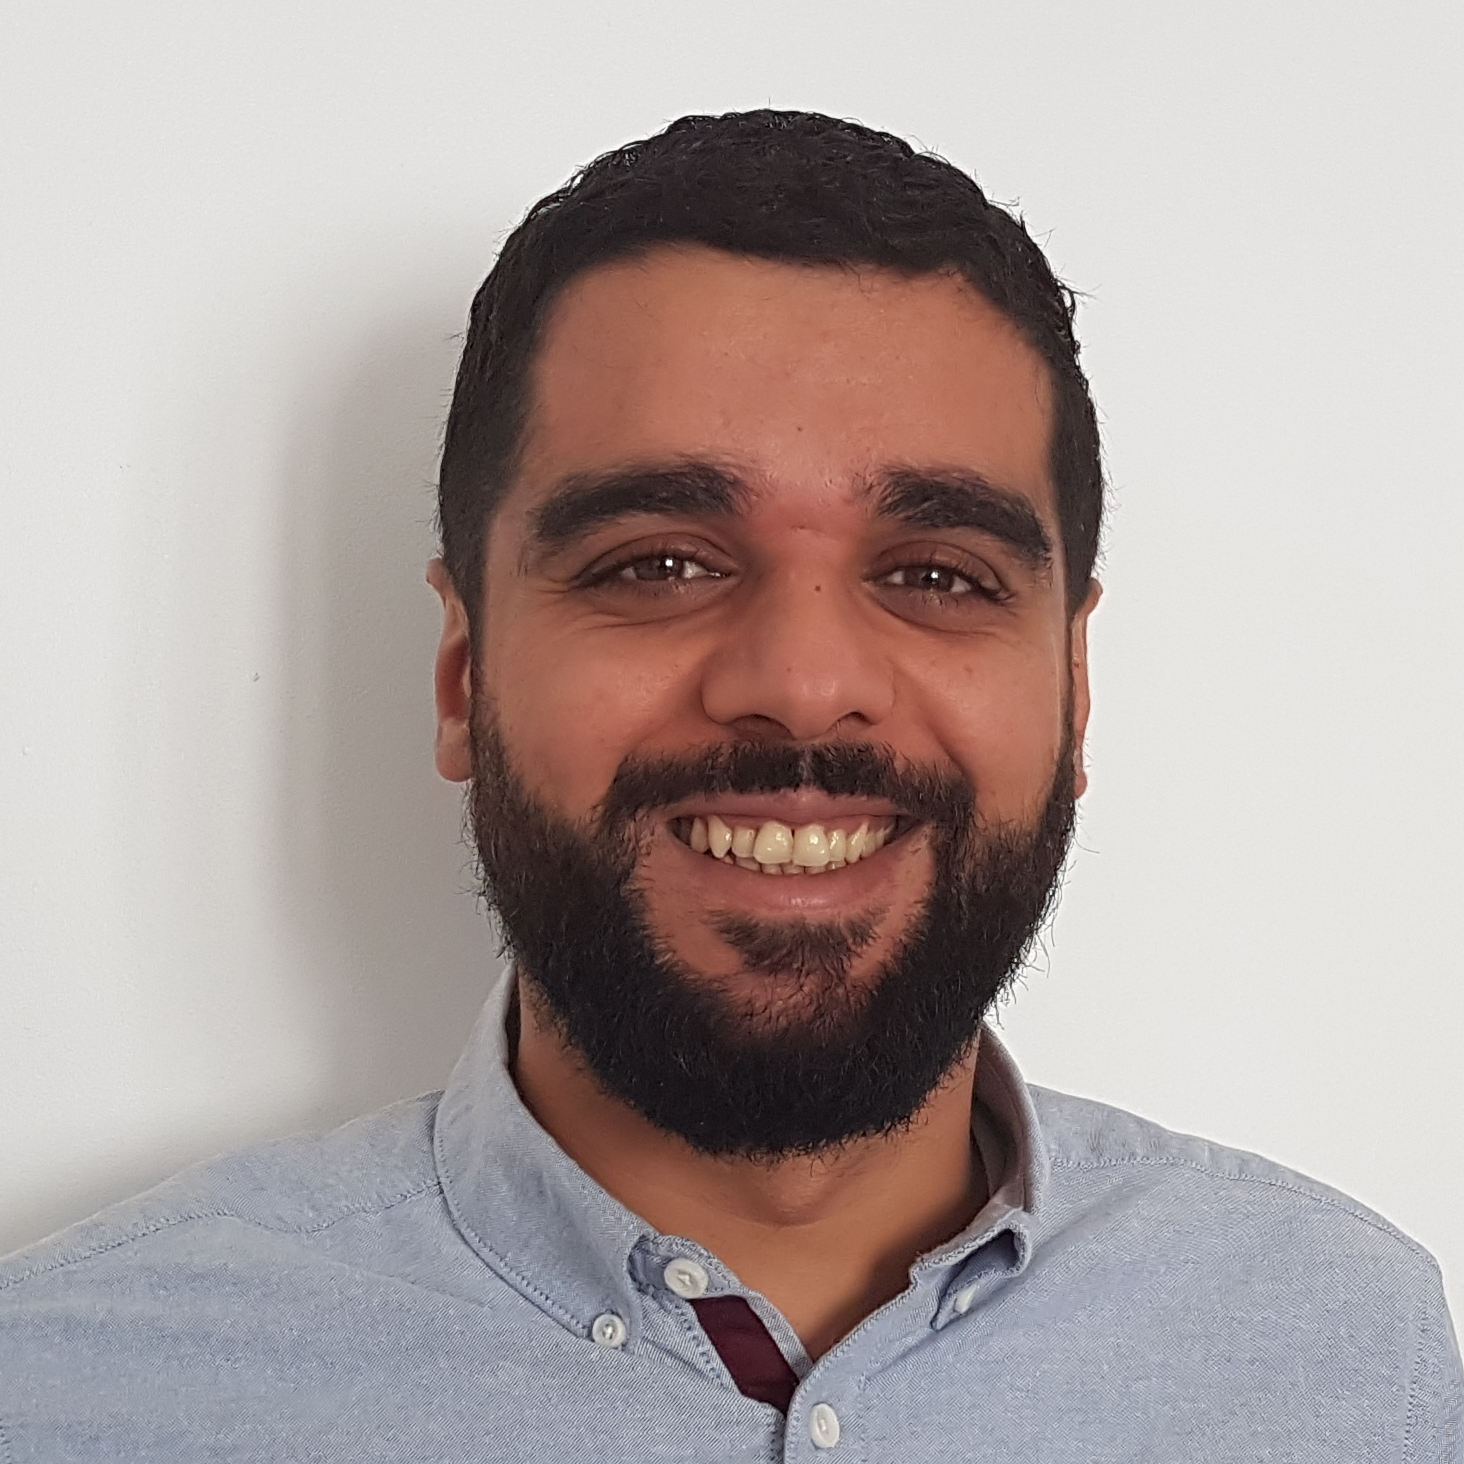 Ahmed El Khadiri